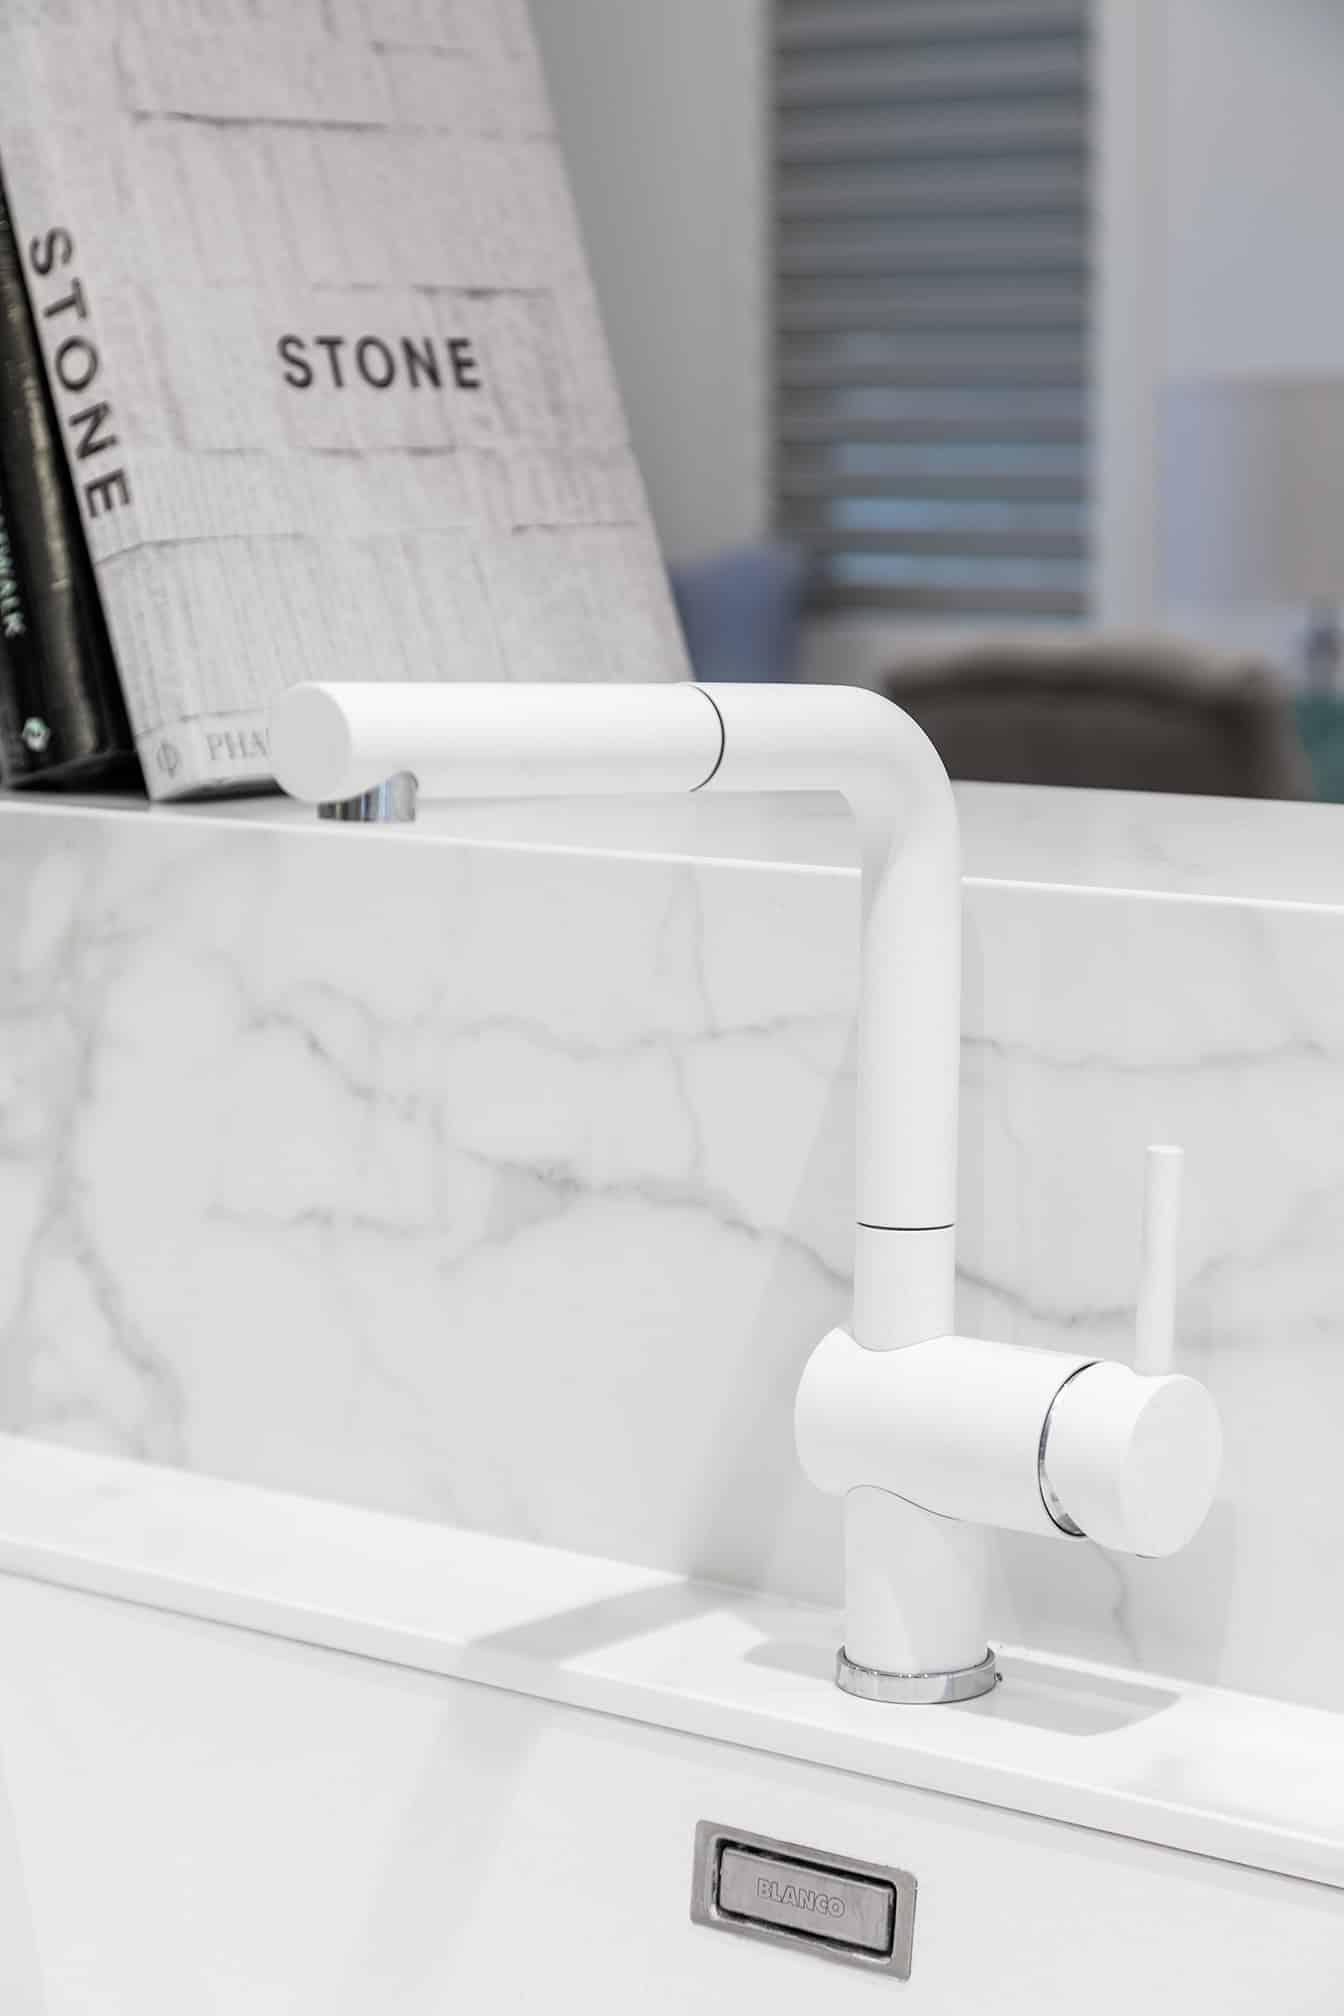 Joondanna Hamptons Kitchen tap and backsplash